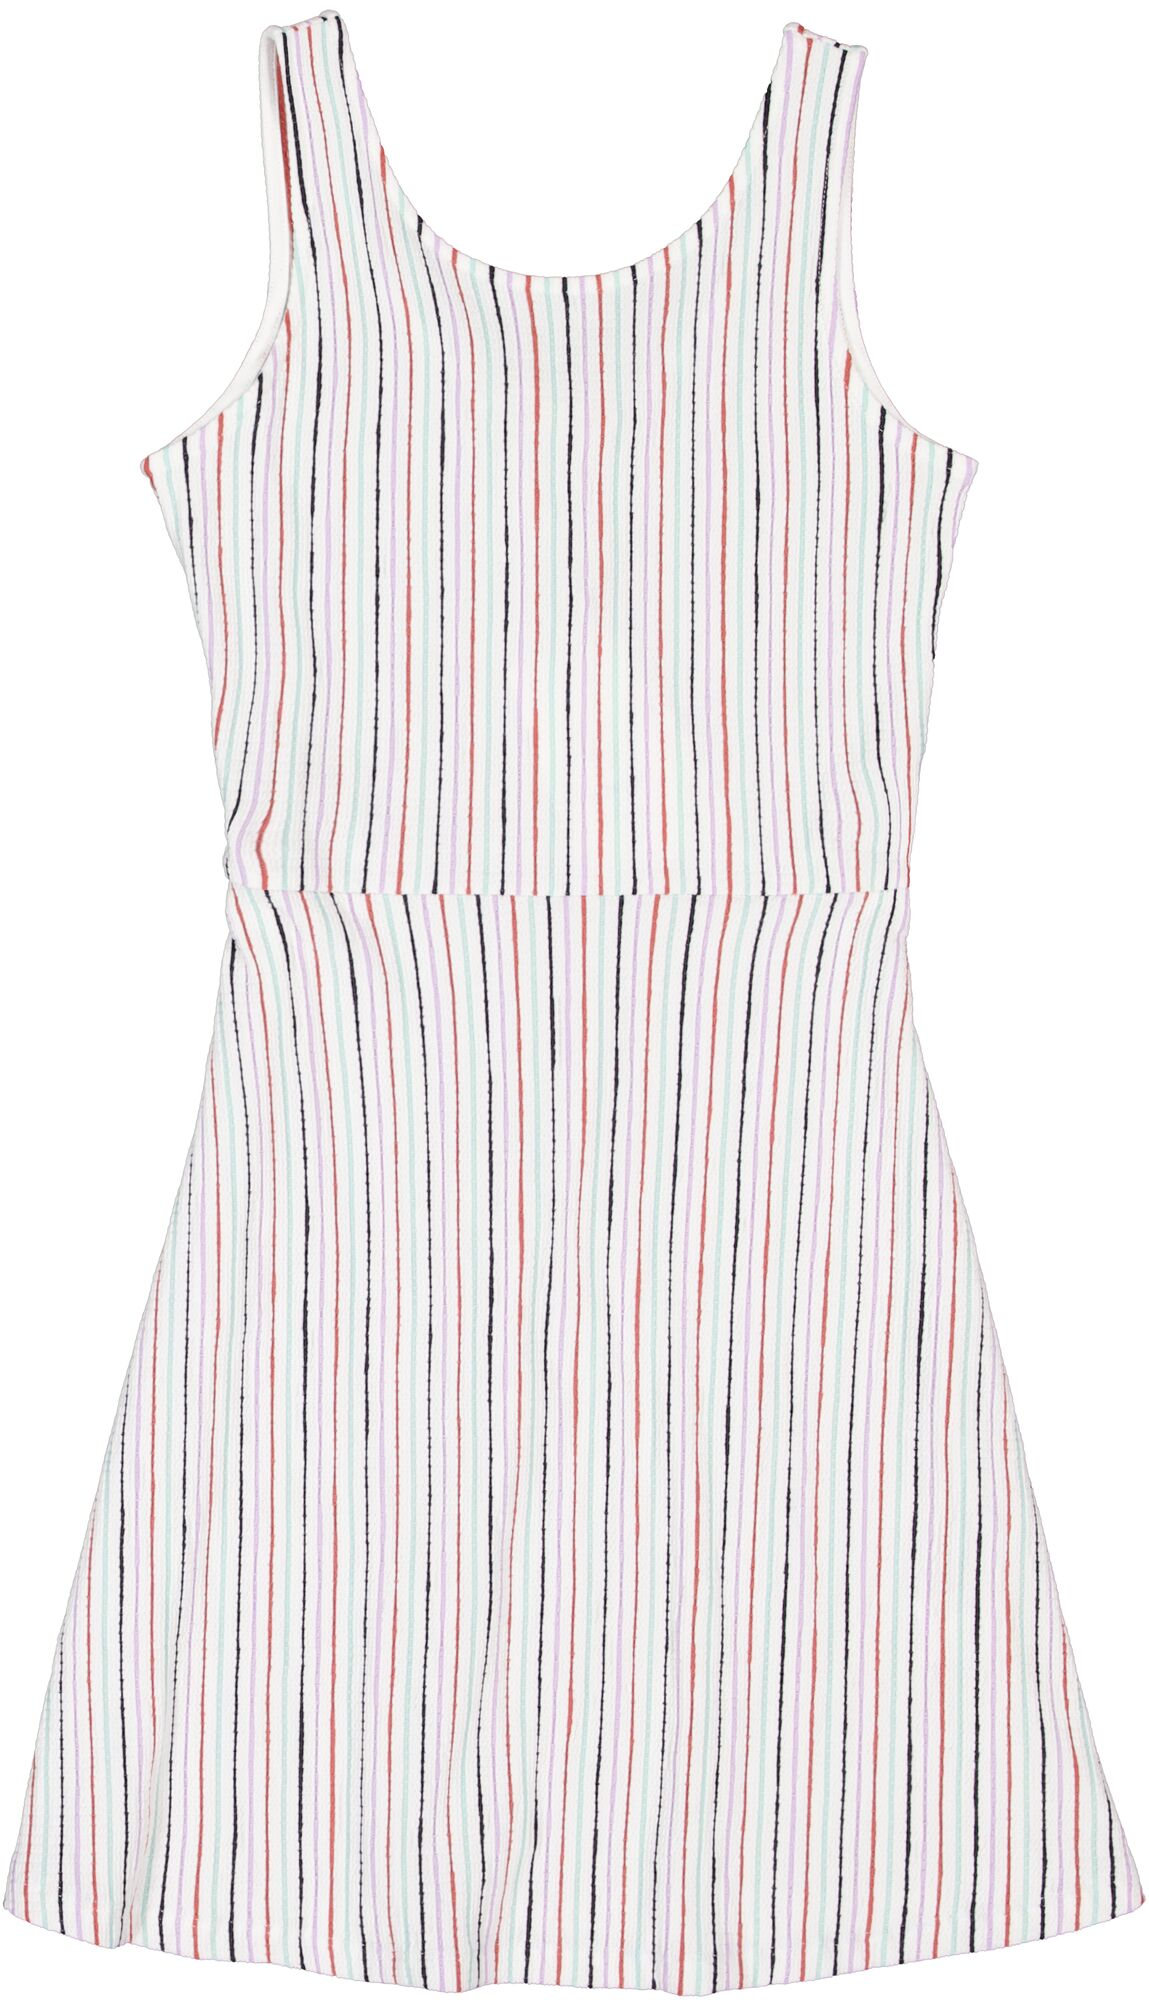 Garcia - Girls-Dresses